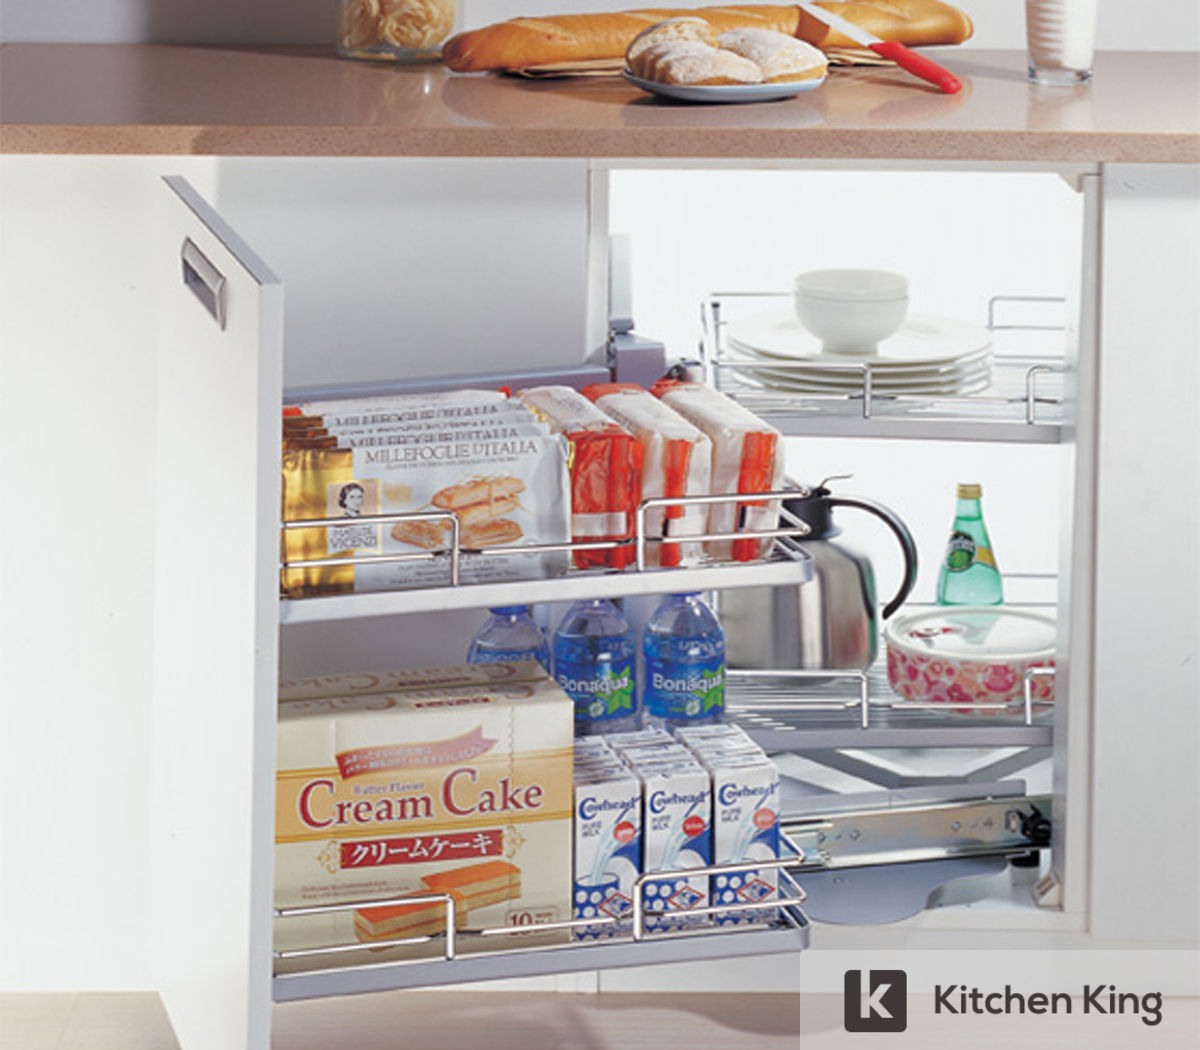 100 Kitchen Cabinet Accessory Kitchen Country  : magic corner 1200X1050043a443e71e9487a0240ad4c89122eb1 from jojogor.com size 1200 x 1050 jpeg 148kB